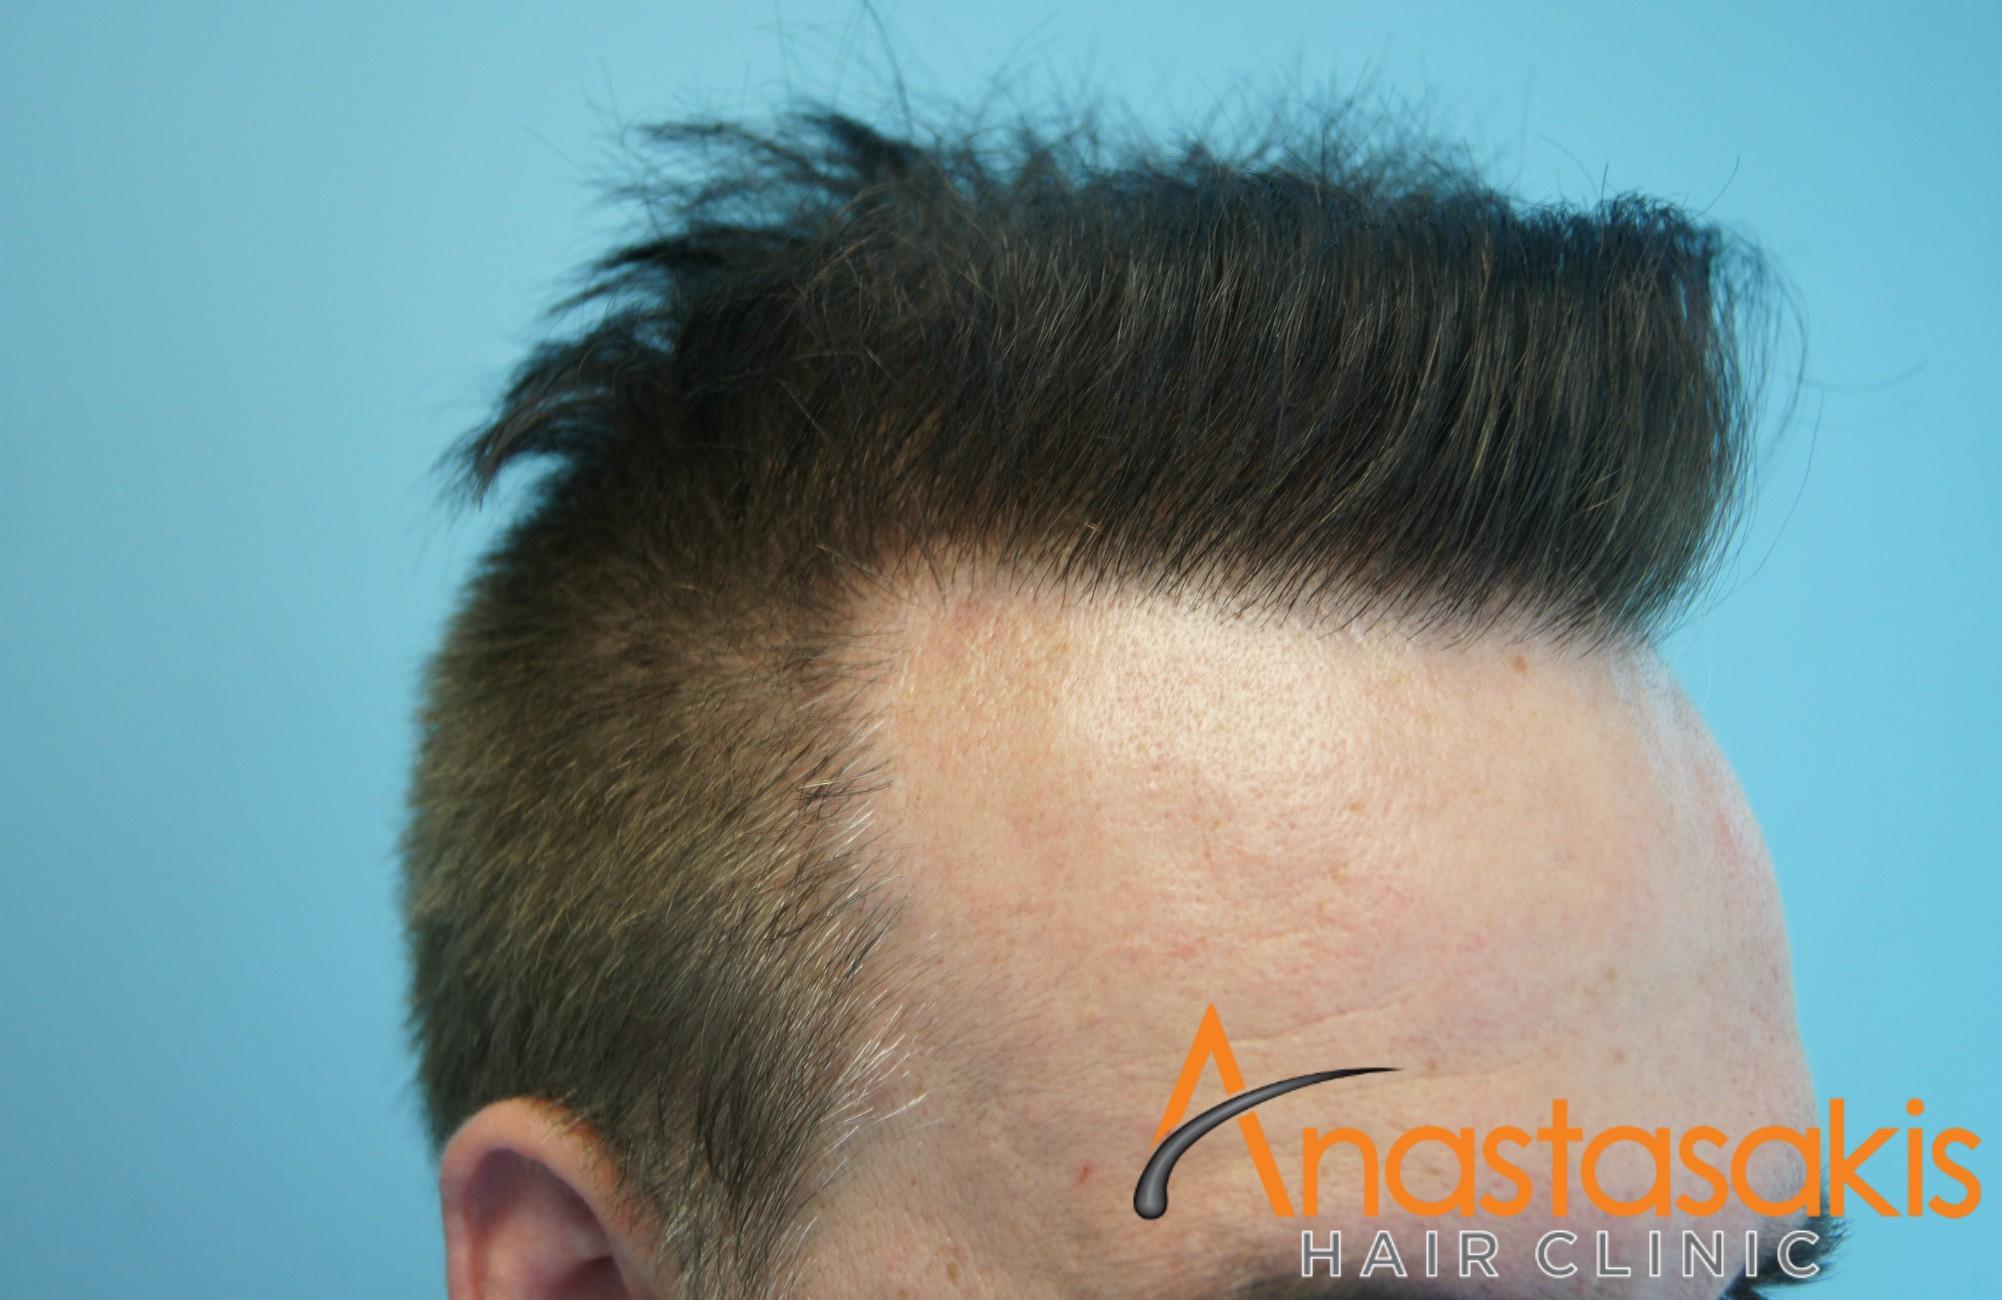 3500fus-result-anastasakis-hair-clinic-megasession